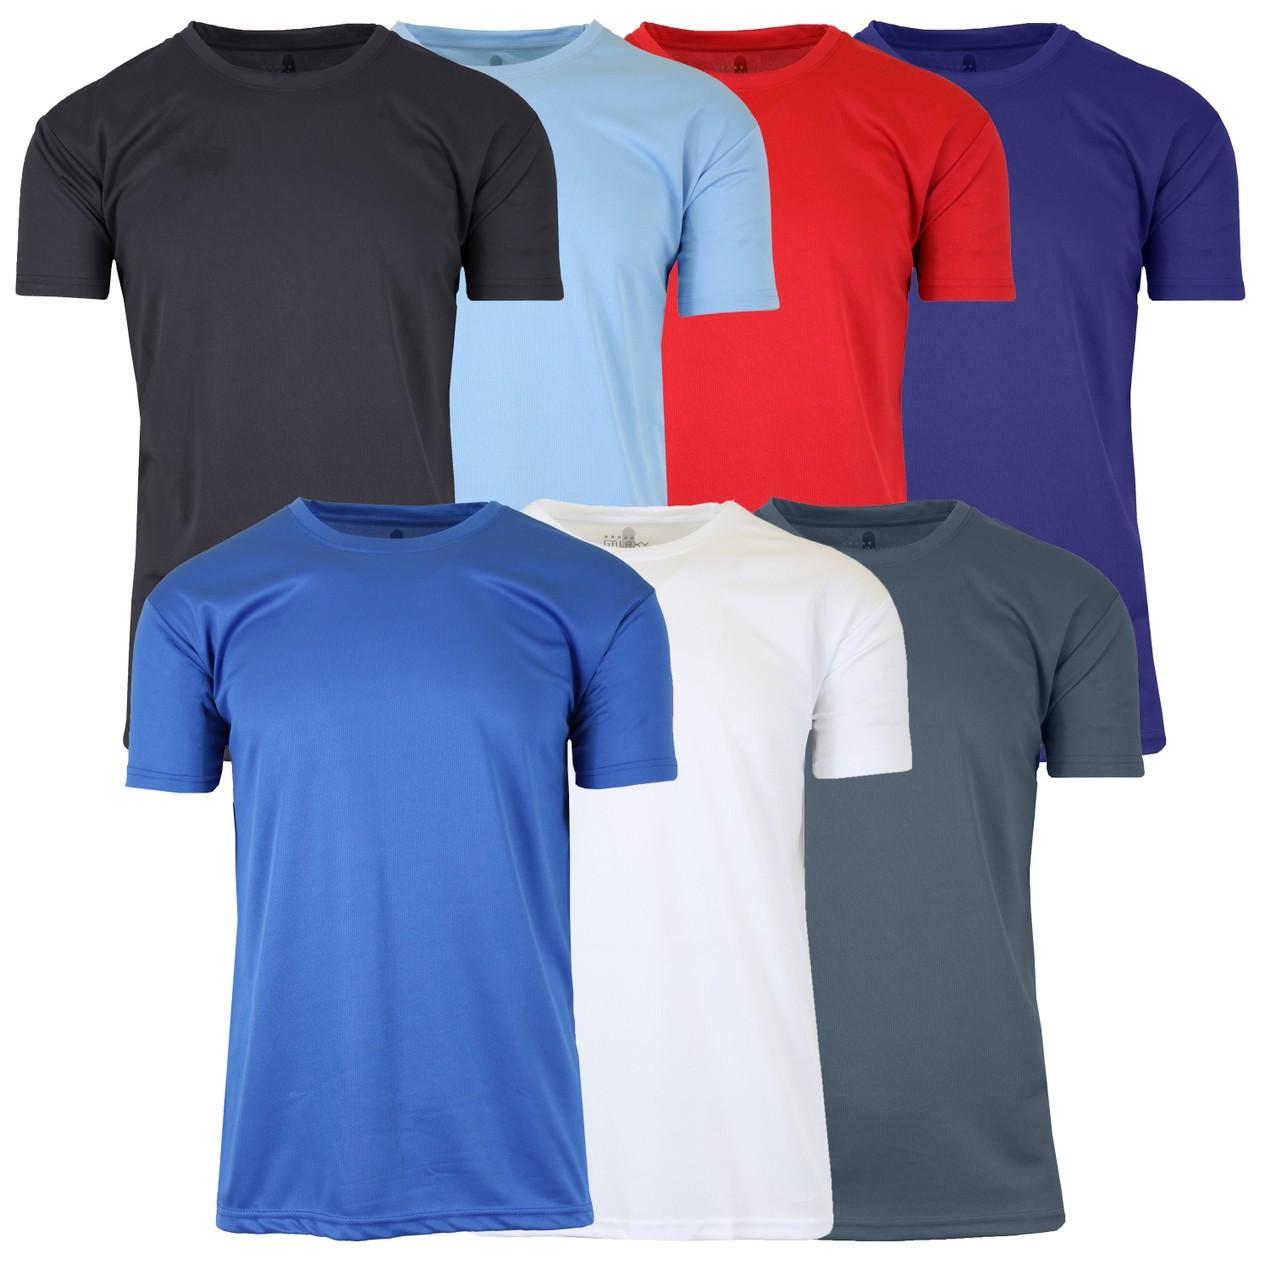 6-Pack Assorted Men's Moisture Wrinkle Free Performance Tee w/ Reflective Stripe